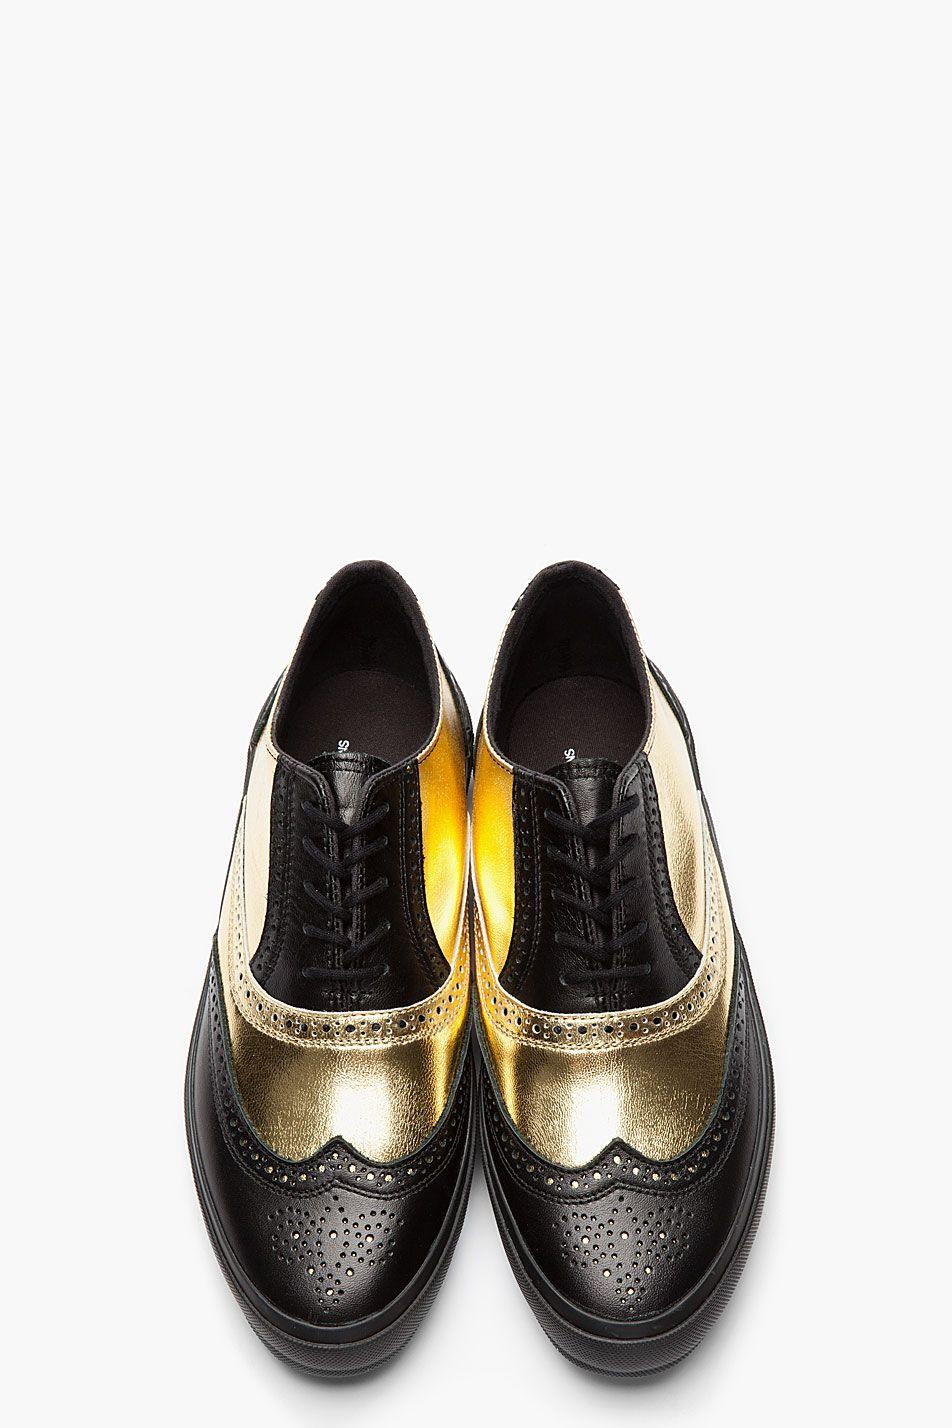 8468afbe104a8b COMME DES GARÇONS HOMME PLUS Black   Metallic Gold Leather Wingtip Brogue  Sneakers